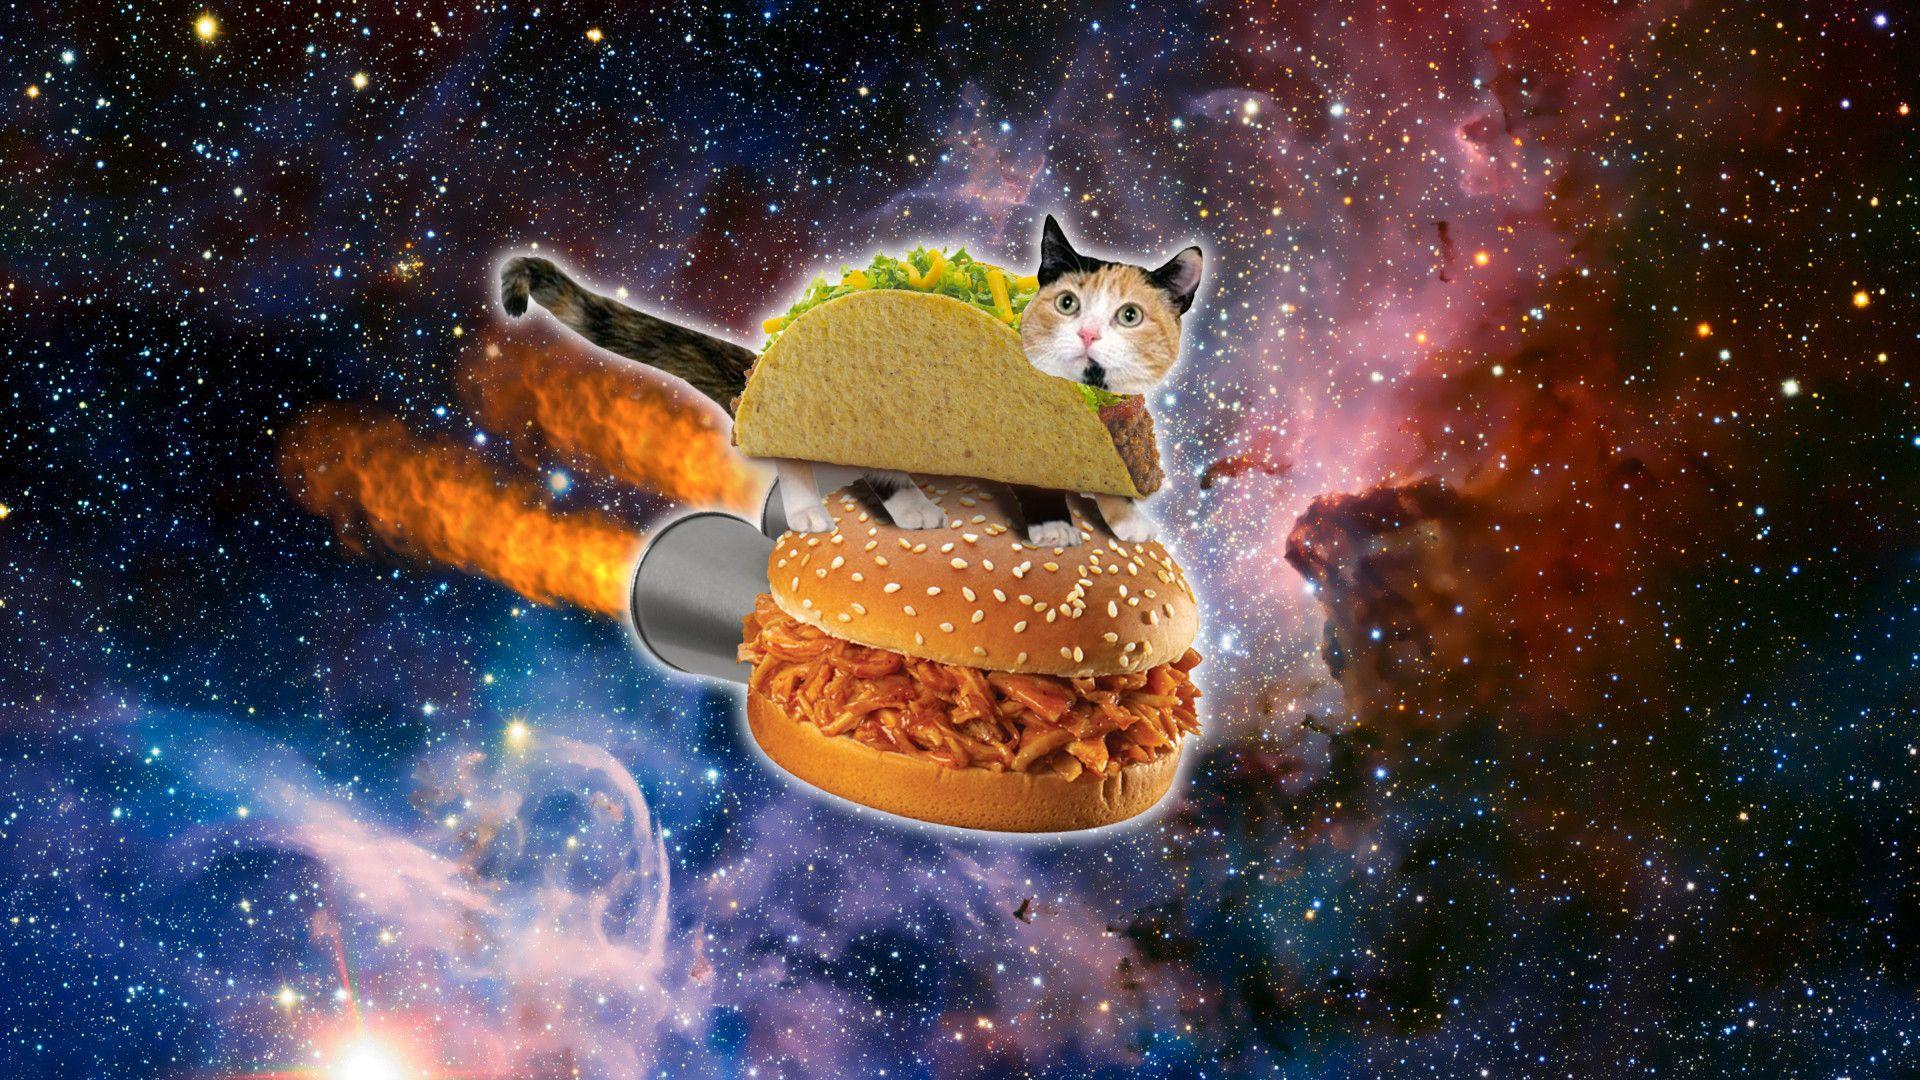 Res 1920x1080 Space Cat Wallpaper Mobile Taco Cat Cat Wallpaper Space Cat